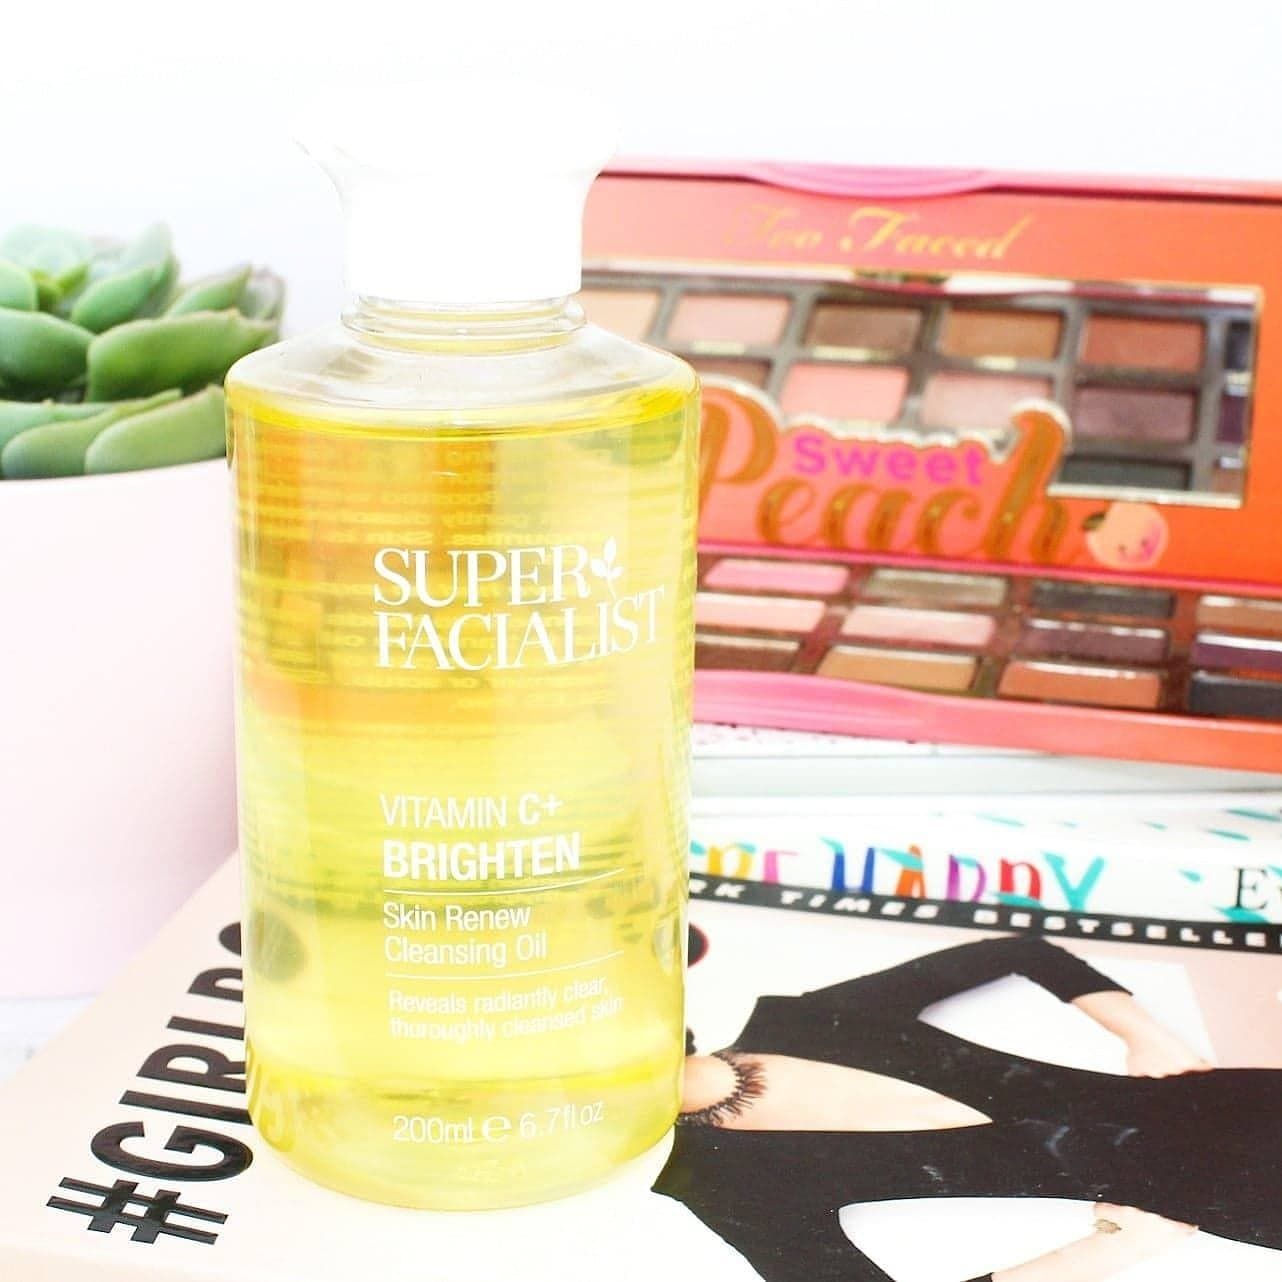 Super Facialist Vitamin C+ Brighten Cleansing Oil